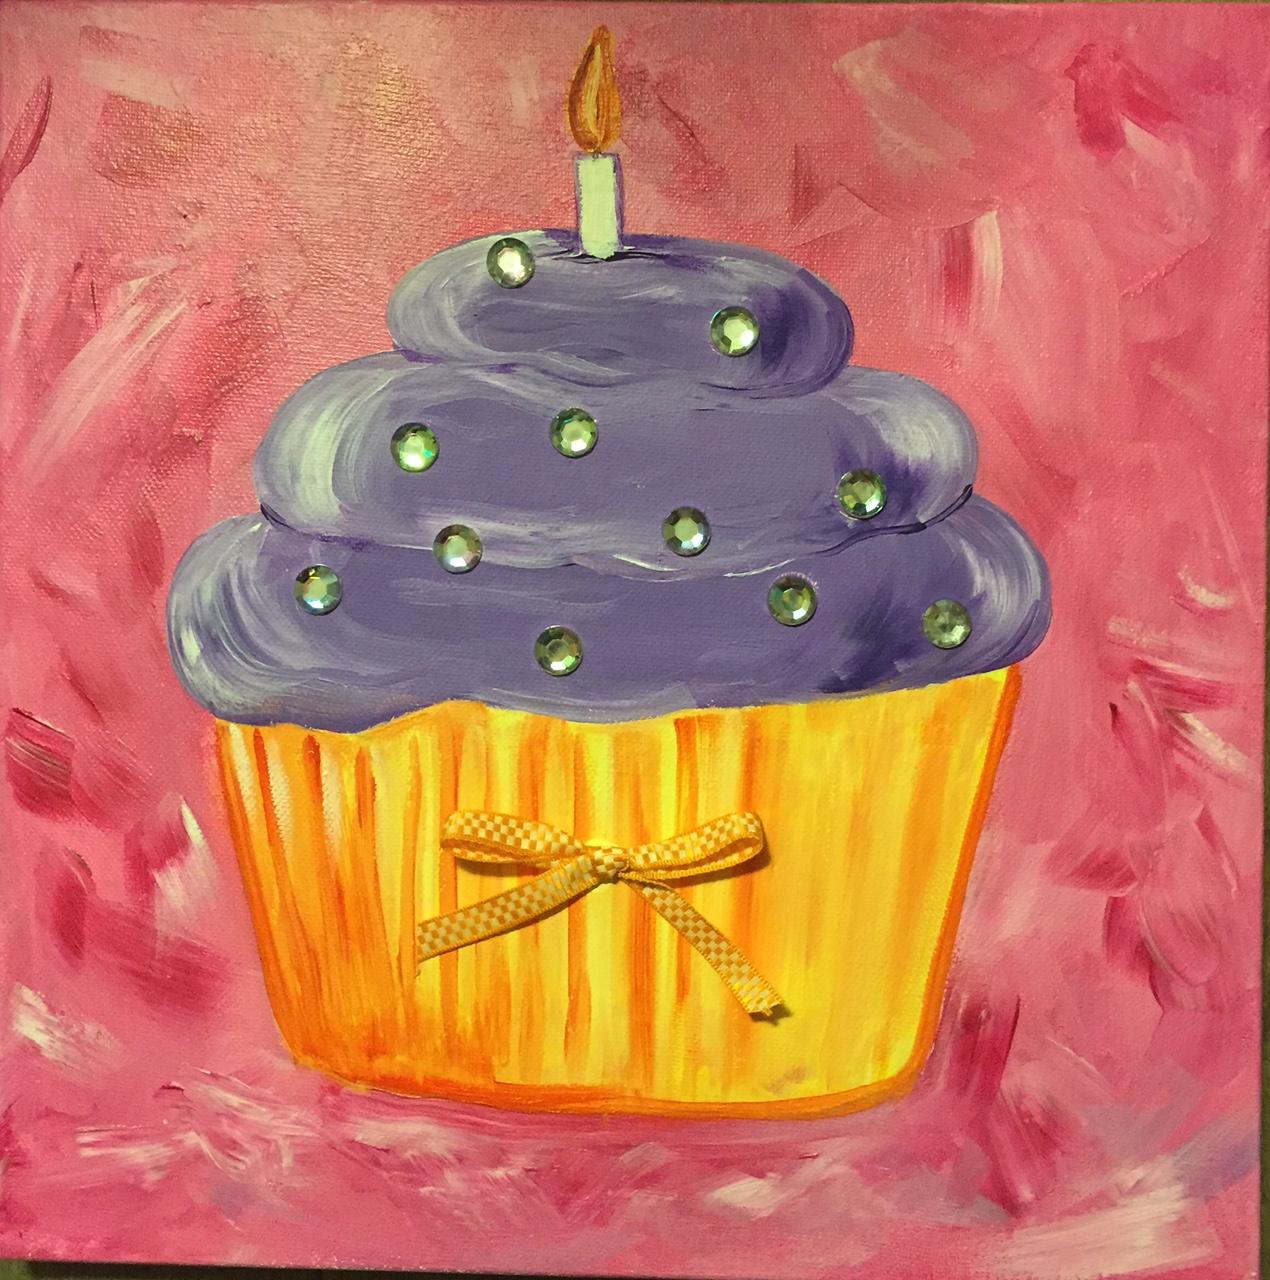 Cupcake SH.JPG